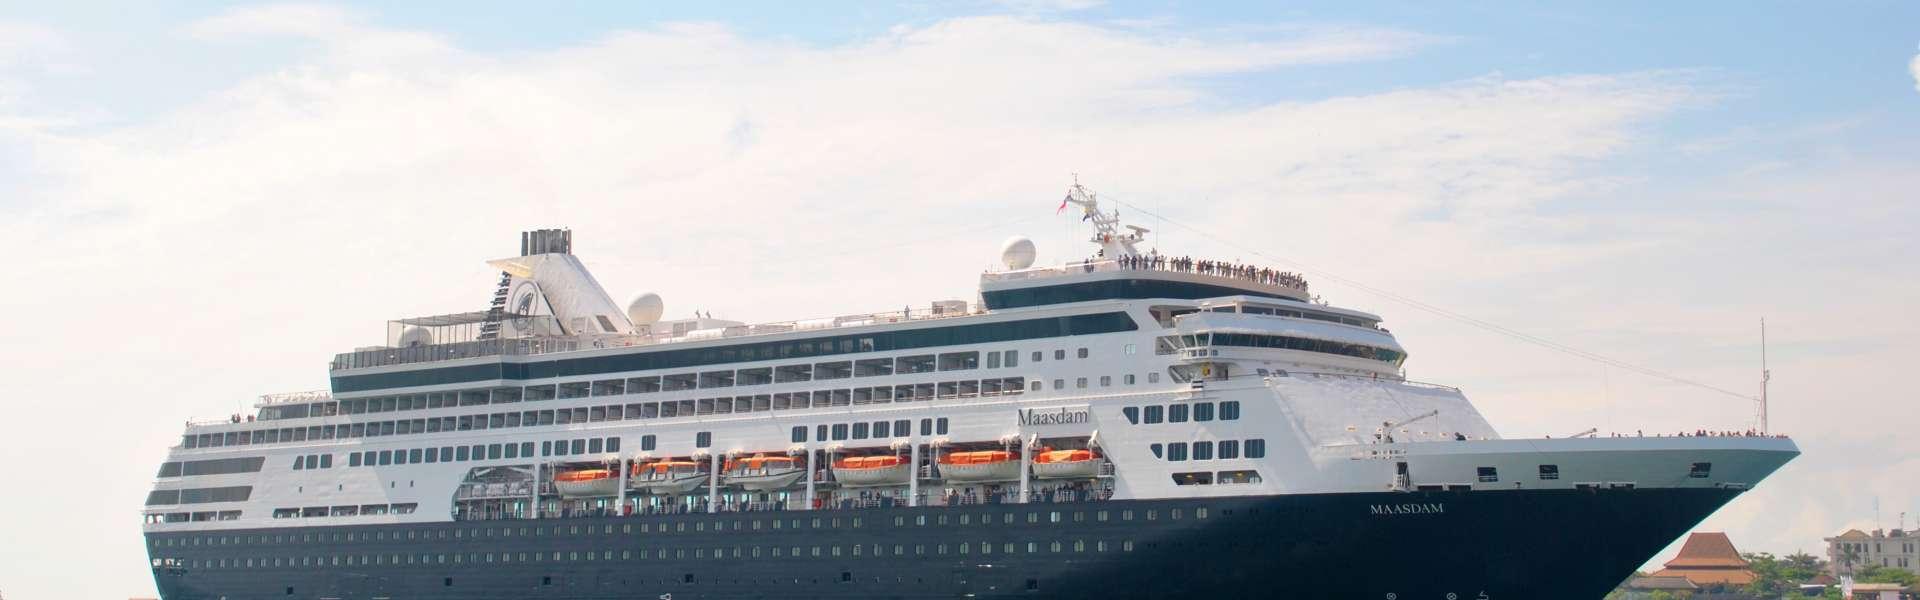 Croaziera 2019 - Japonia si Orientul Indepartat (Yokohama) - Holland America Line - Maasdam - 14 nopti